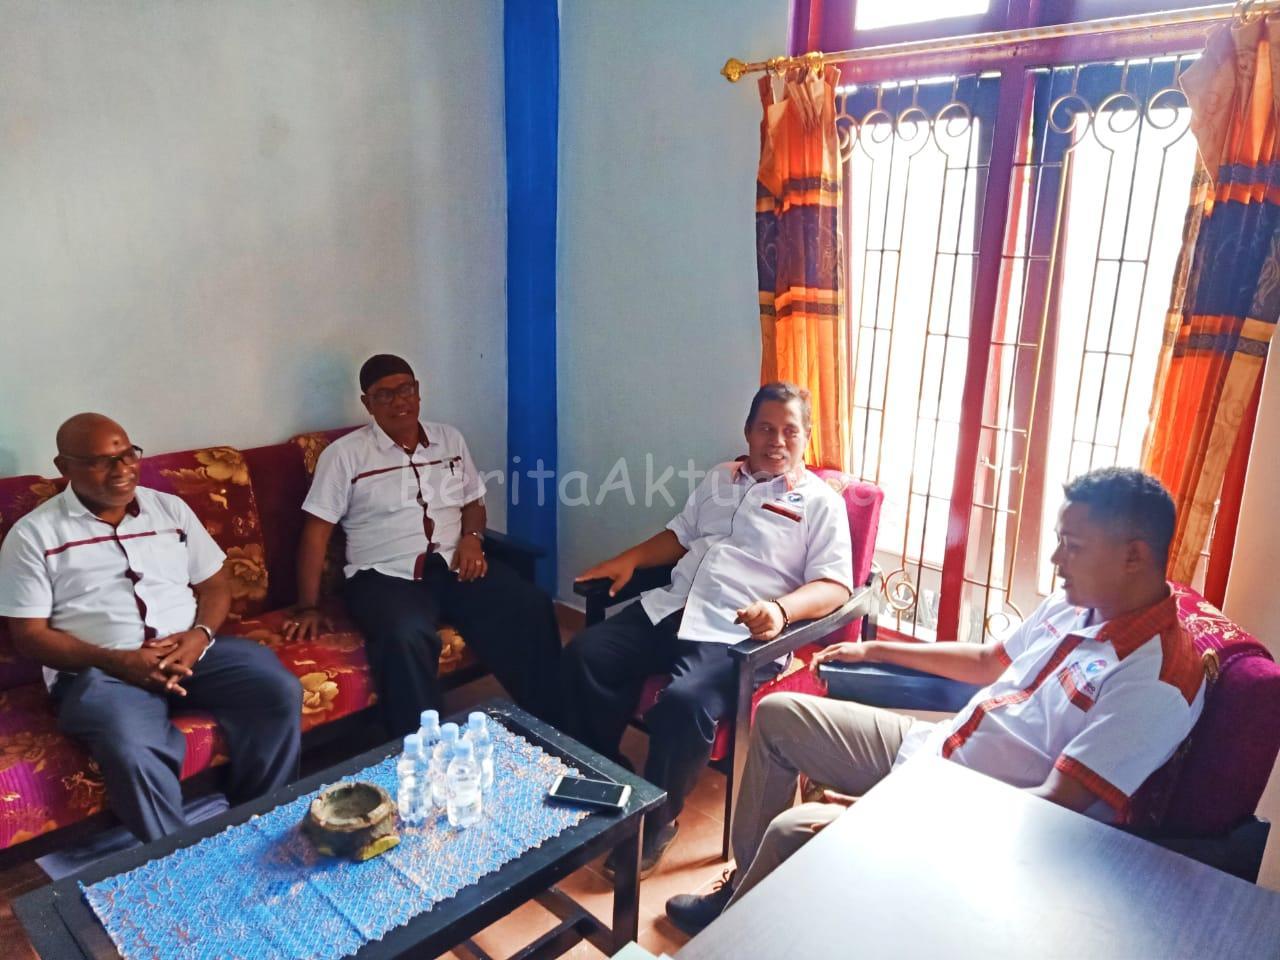 Siap Maju Pilkada 2020, Pasangan BW Mendaftar di DPD Perindo Manokwari 10 IMG 20200708 WA0039